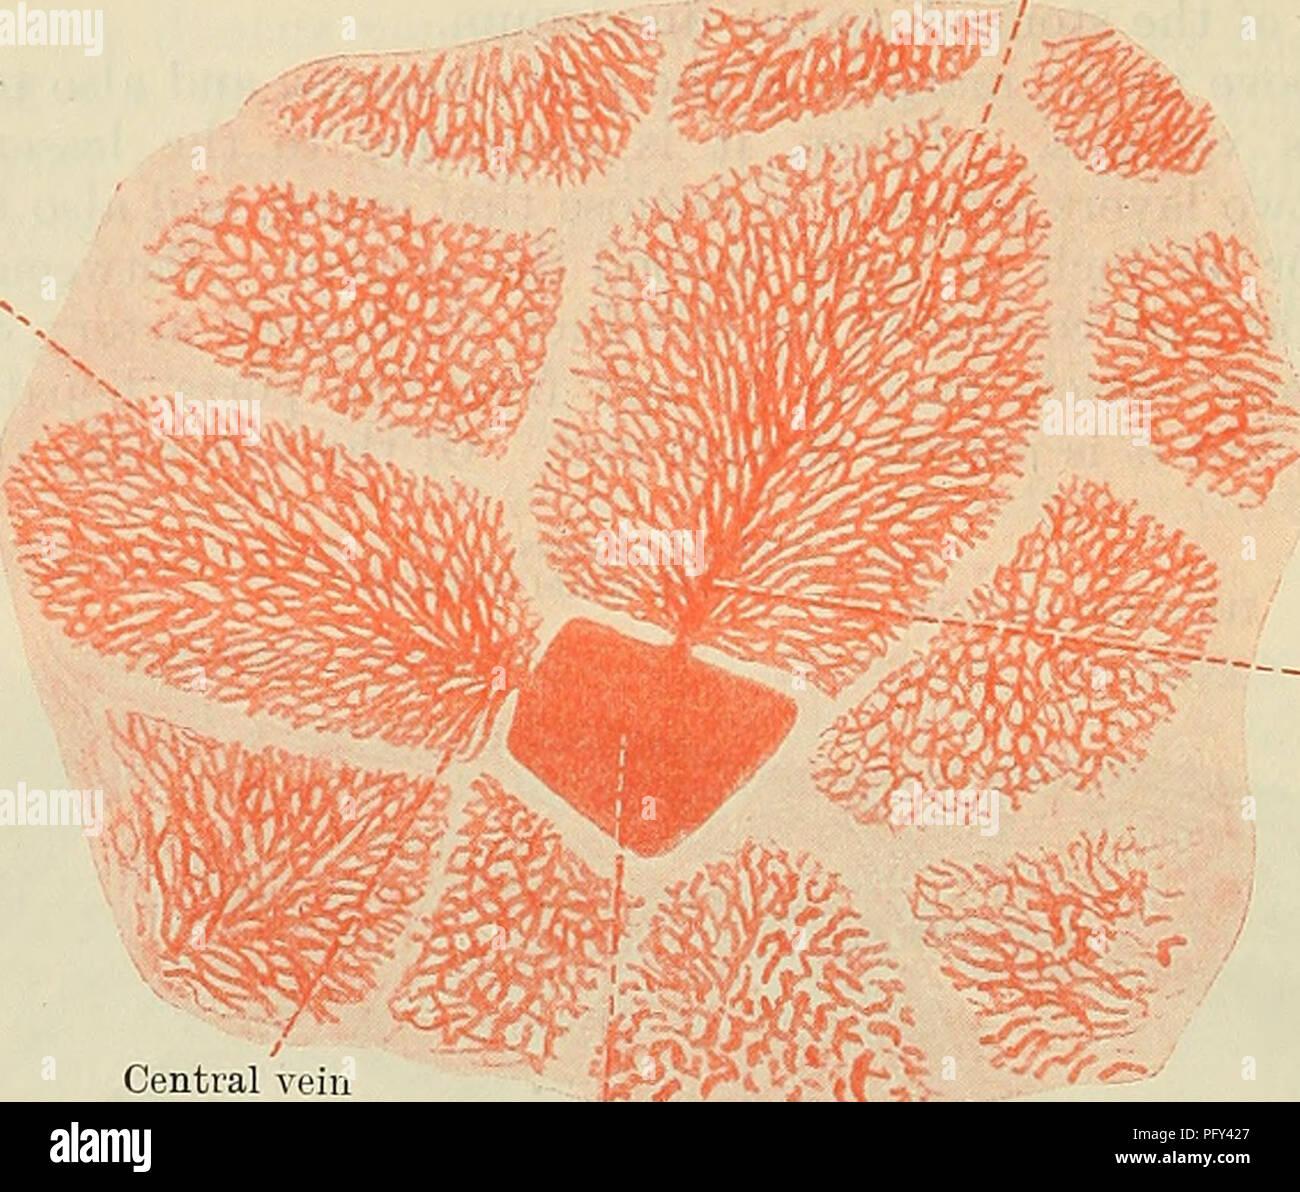 Liver Lobules Stock Photos & Liver Lobules Stock Images - Alamy